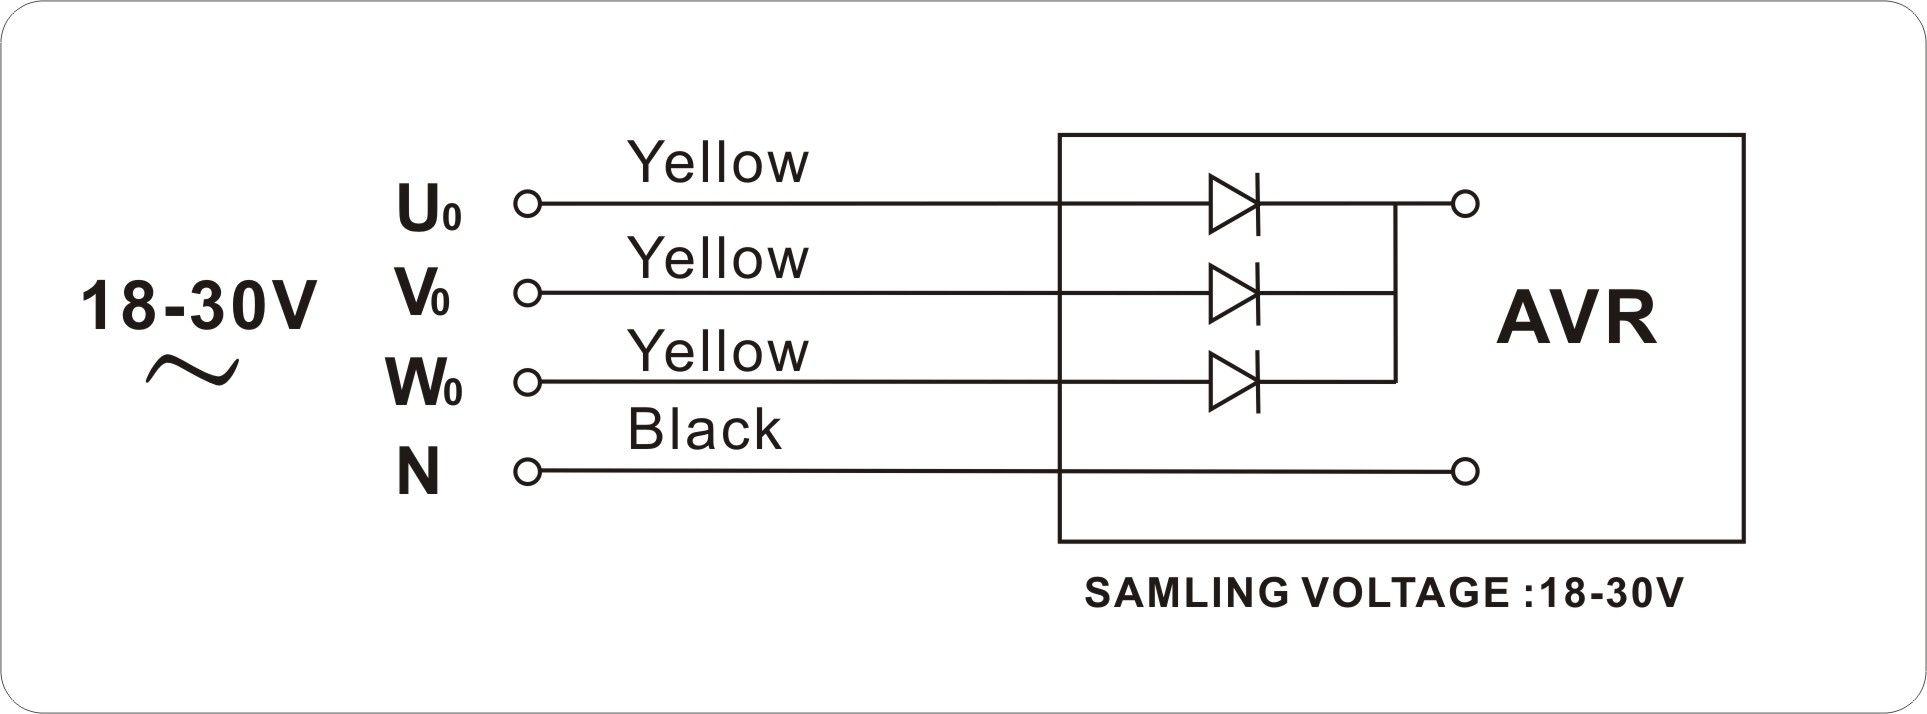 hight resolution of yamada 5 7kw three phase avr for generator three phase generator 5kw avr diagram 5kw avr diagram